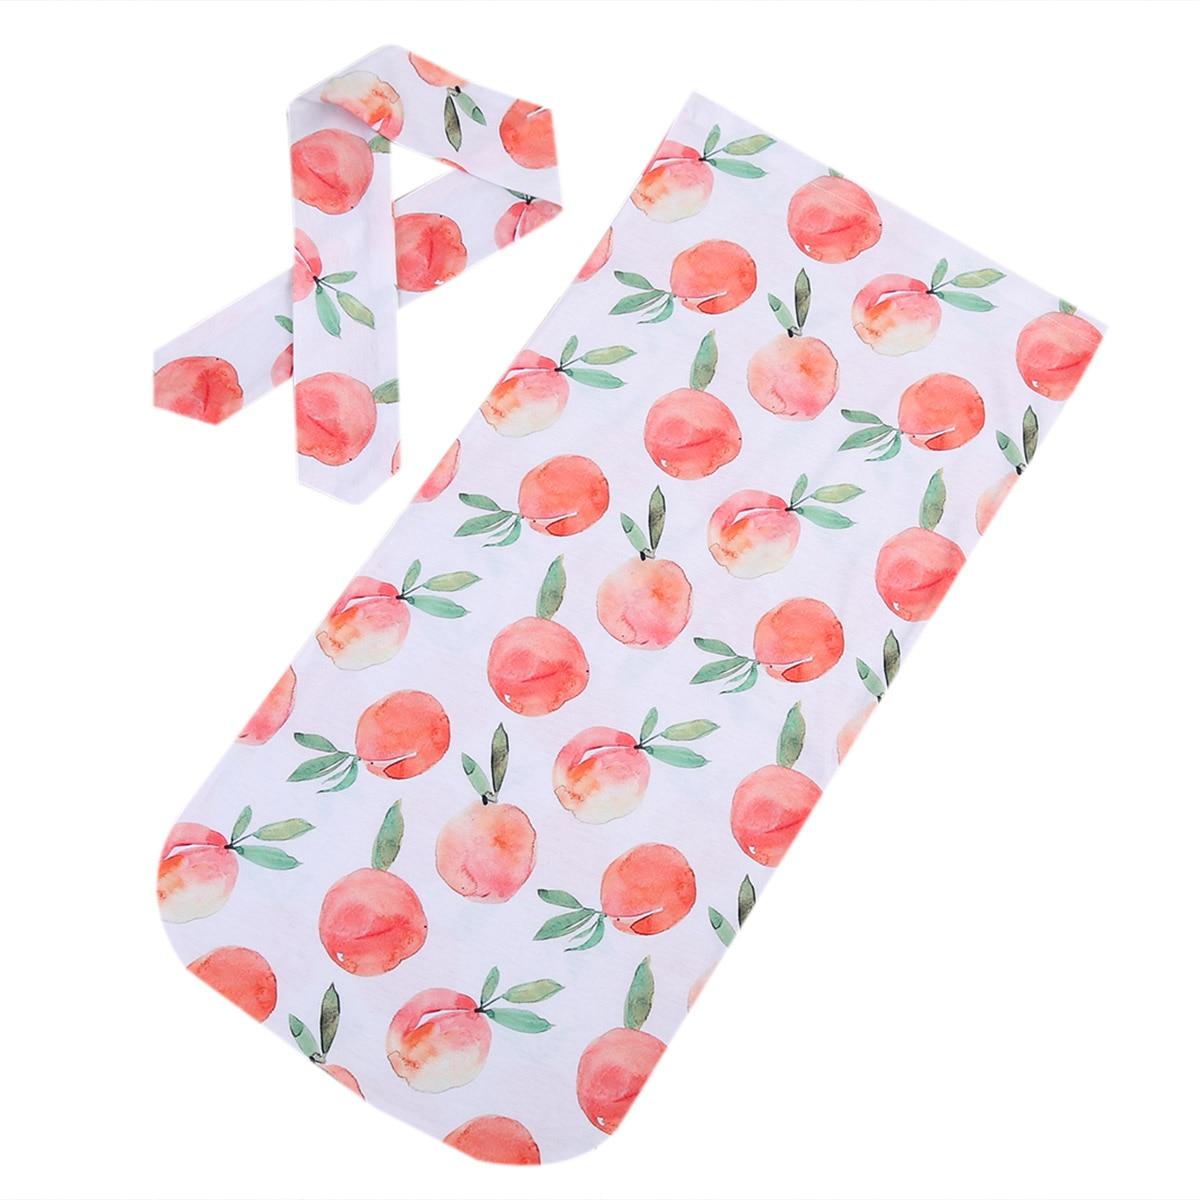 Newborn Infant Baby Cute Swaddle Blanket Baby Comfortable Sleeping Swaddle Muslin Wrap Headband